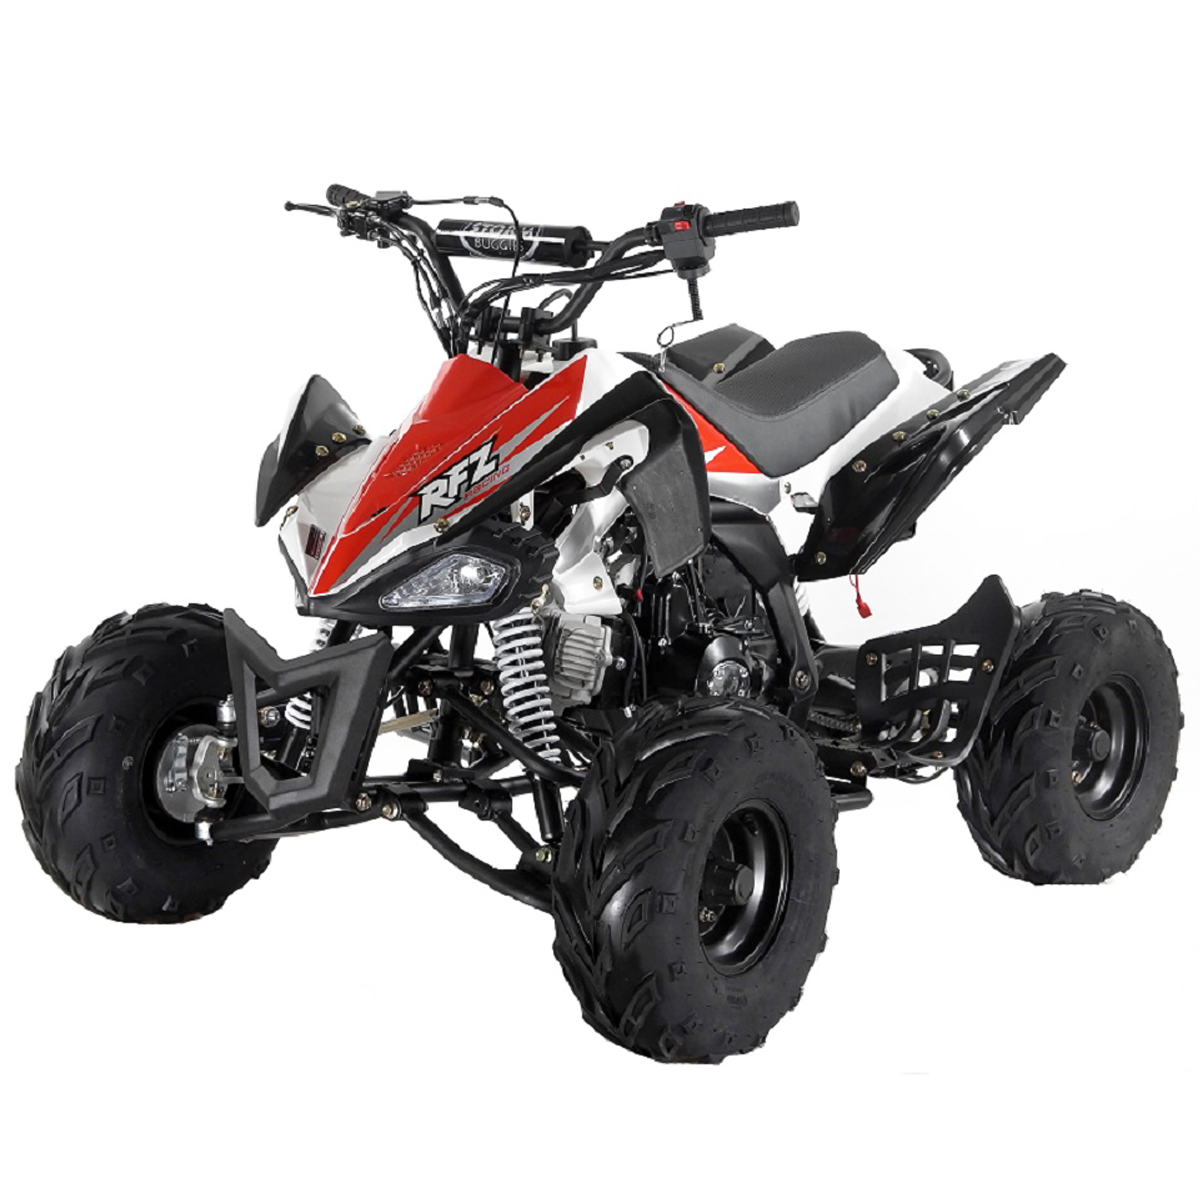 PANTHER 110cc KIDS QUAD BIKE - RED - 2021